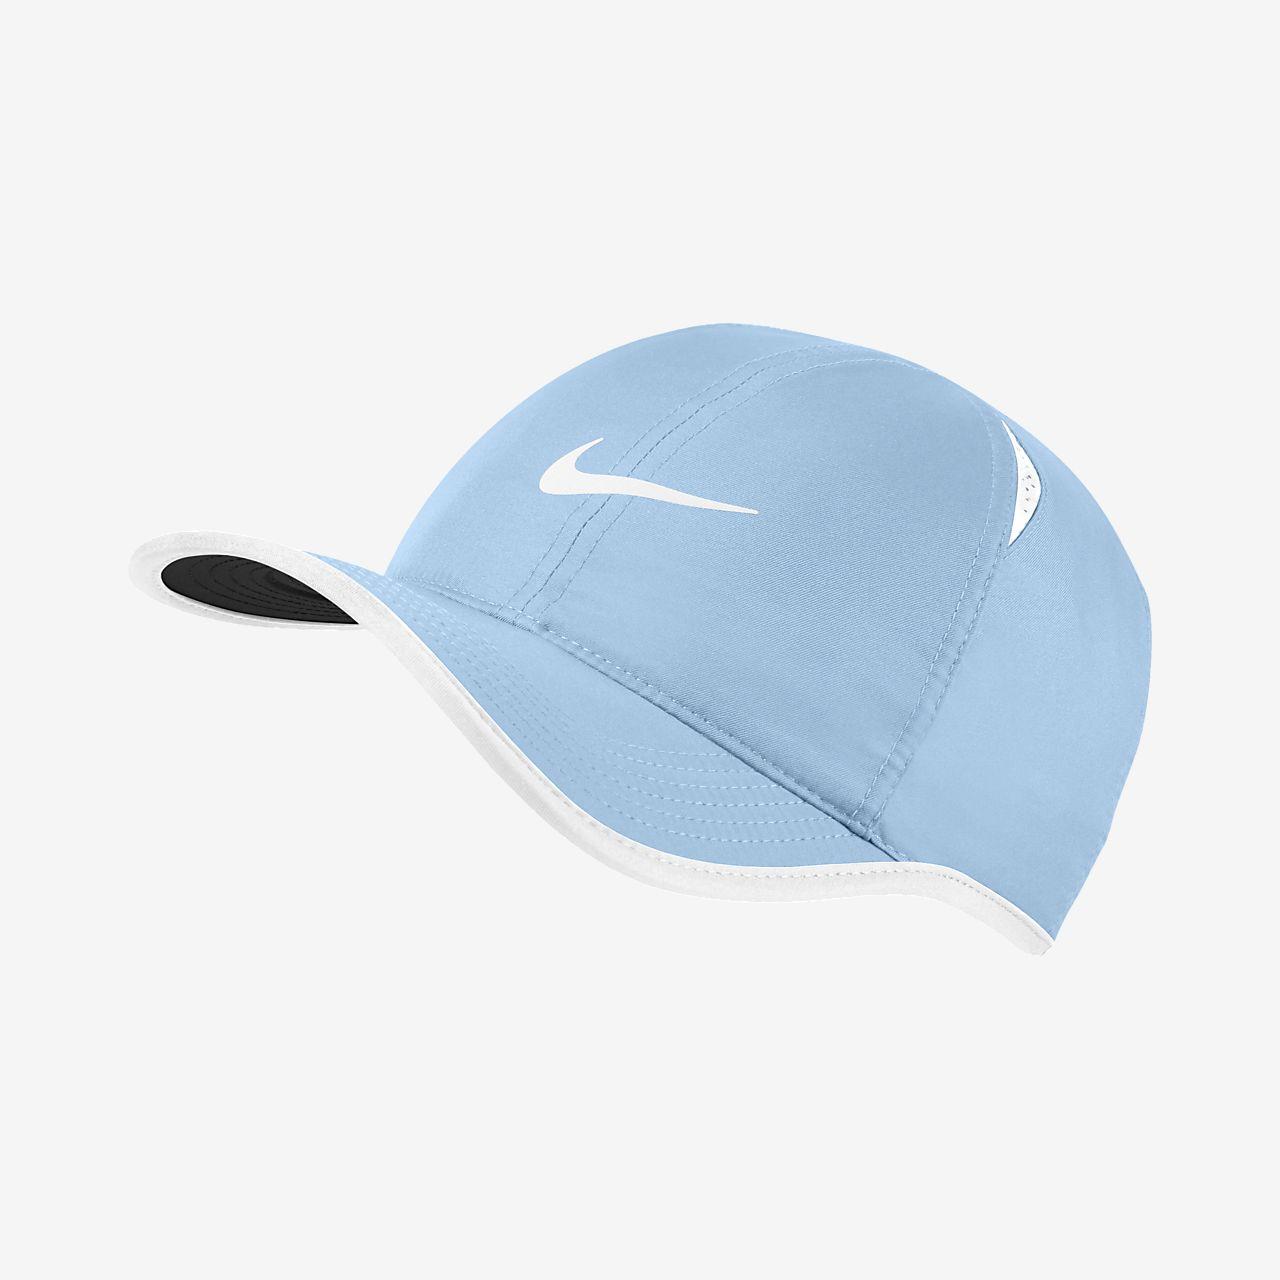 dc967c17bff NikeCourt AeroBill Featherlight Tennis Cap. Nike.com IE